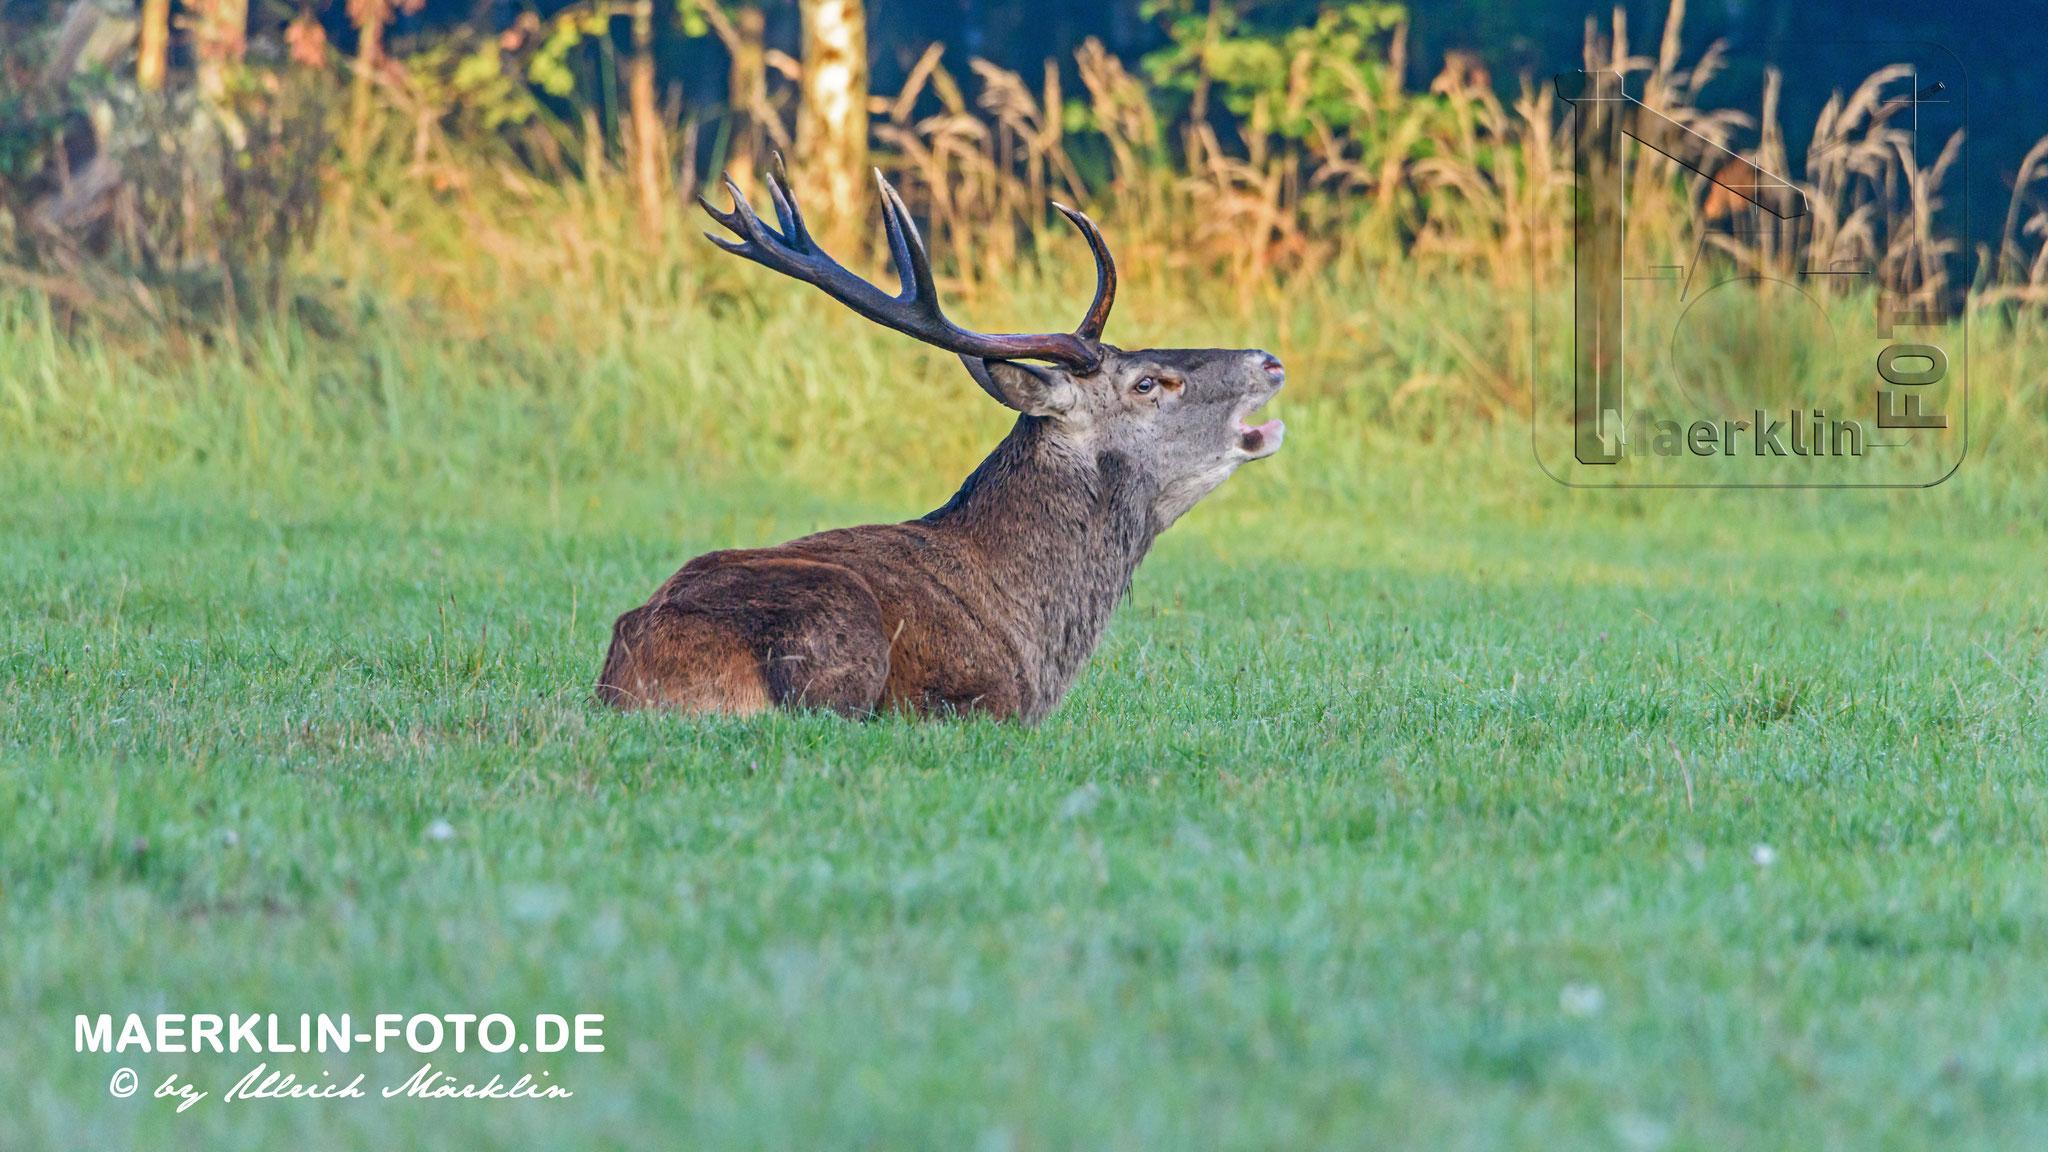 Hirschbrunft, Rothirsch (Cervus elaphus)